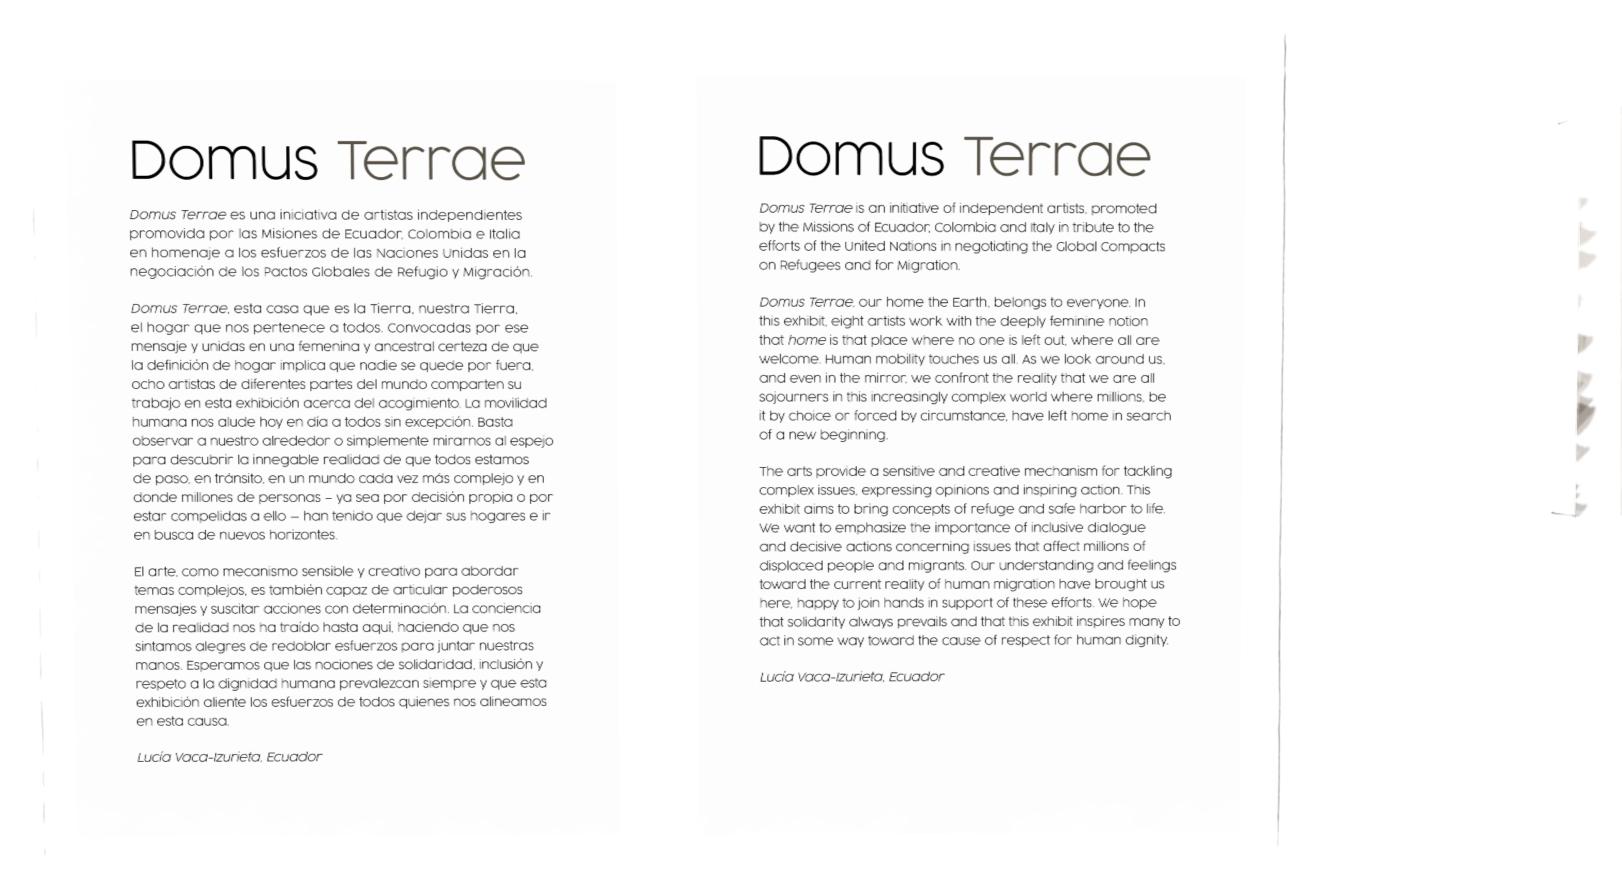 Domus Terrae